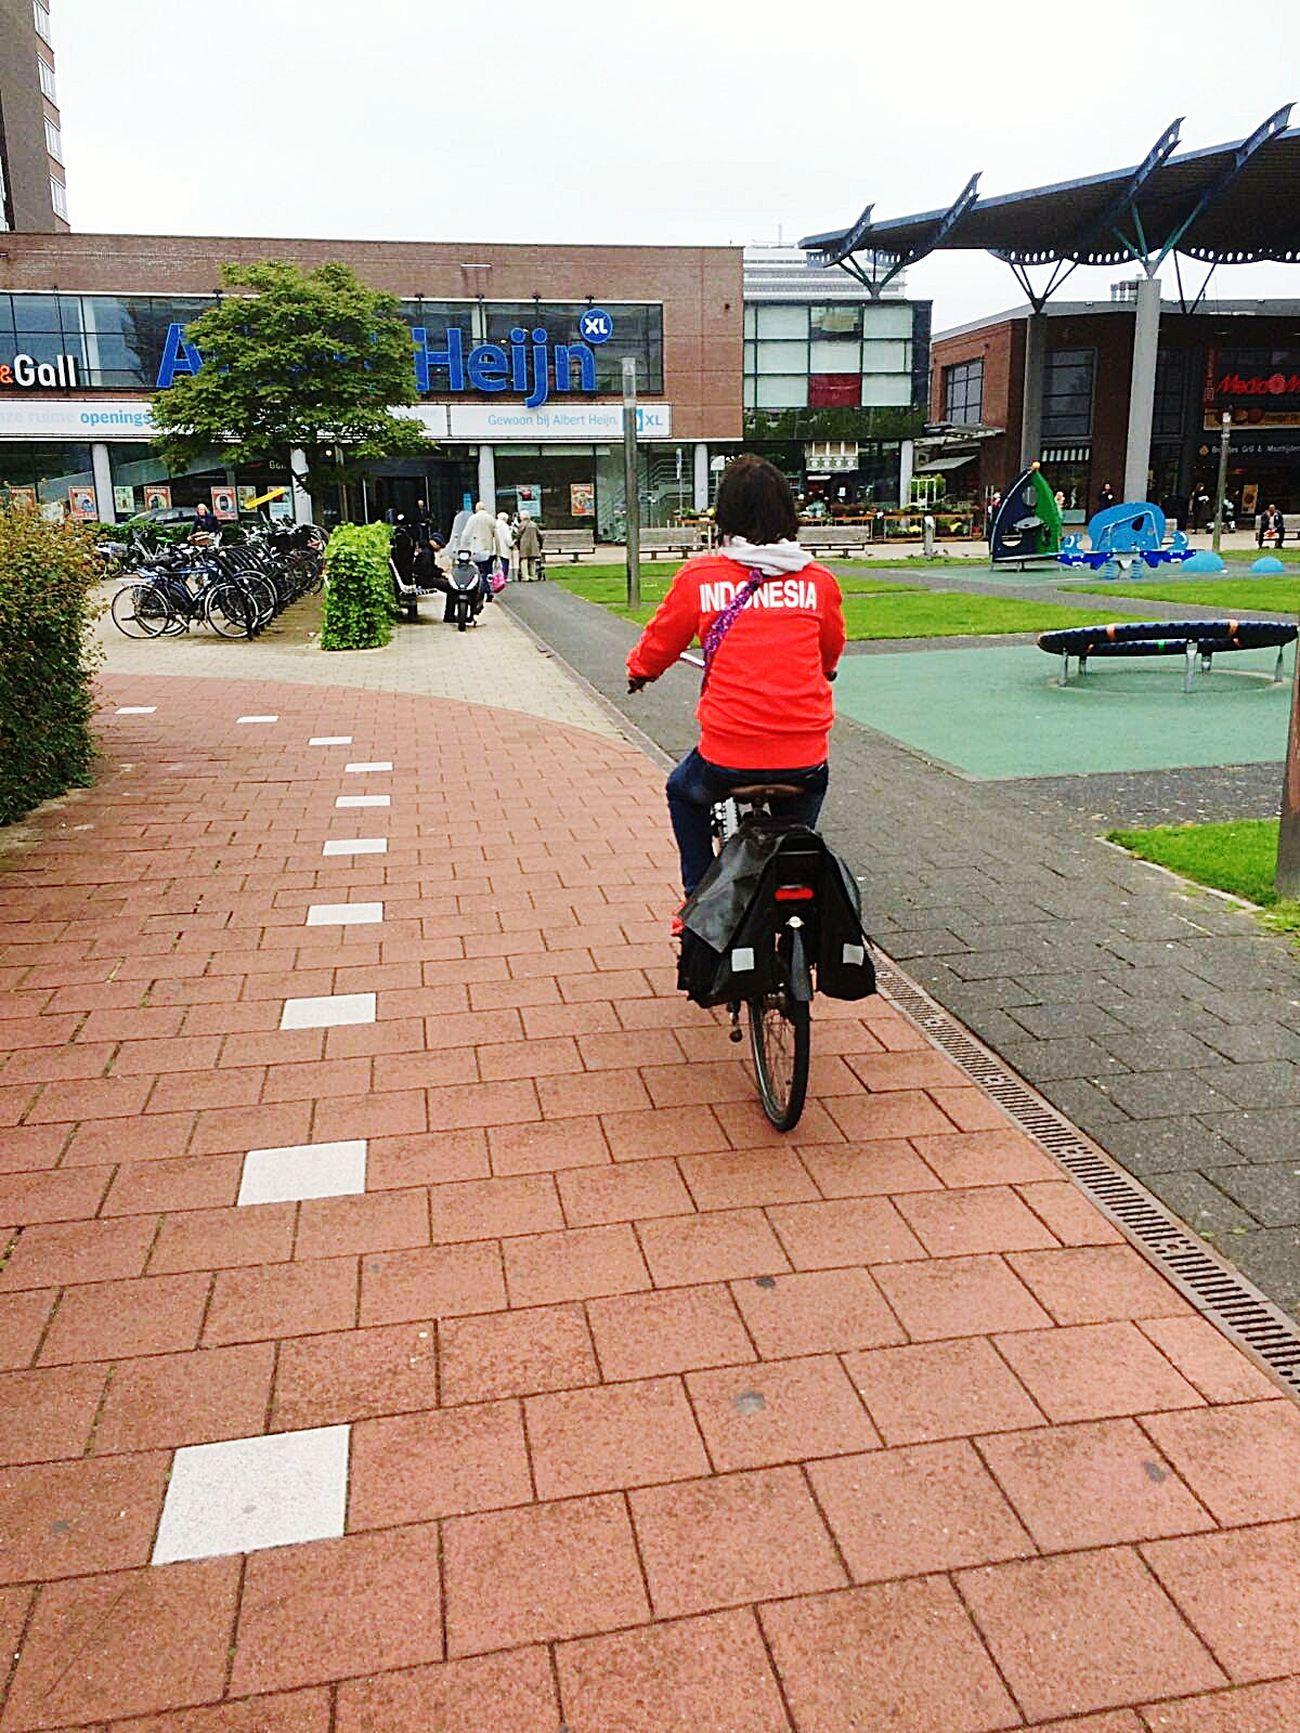 Jalan2 Rijswijk Bycicling Netherlands ❤ 2/6/2016